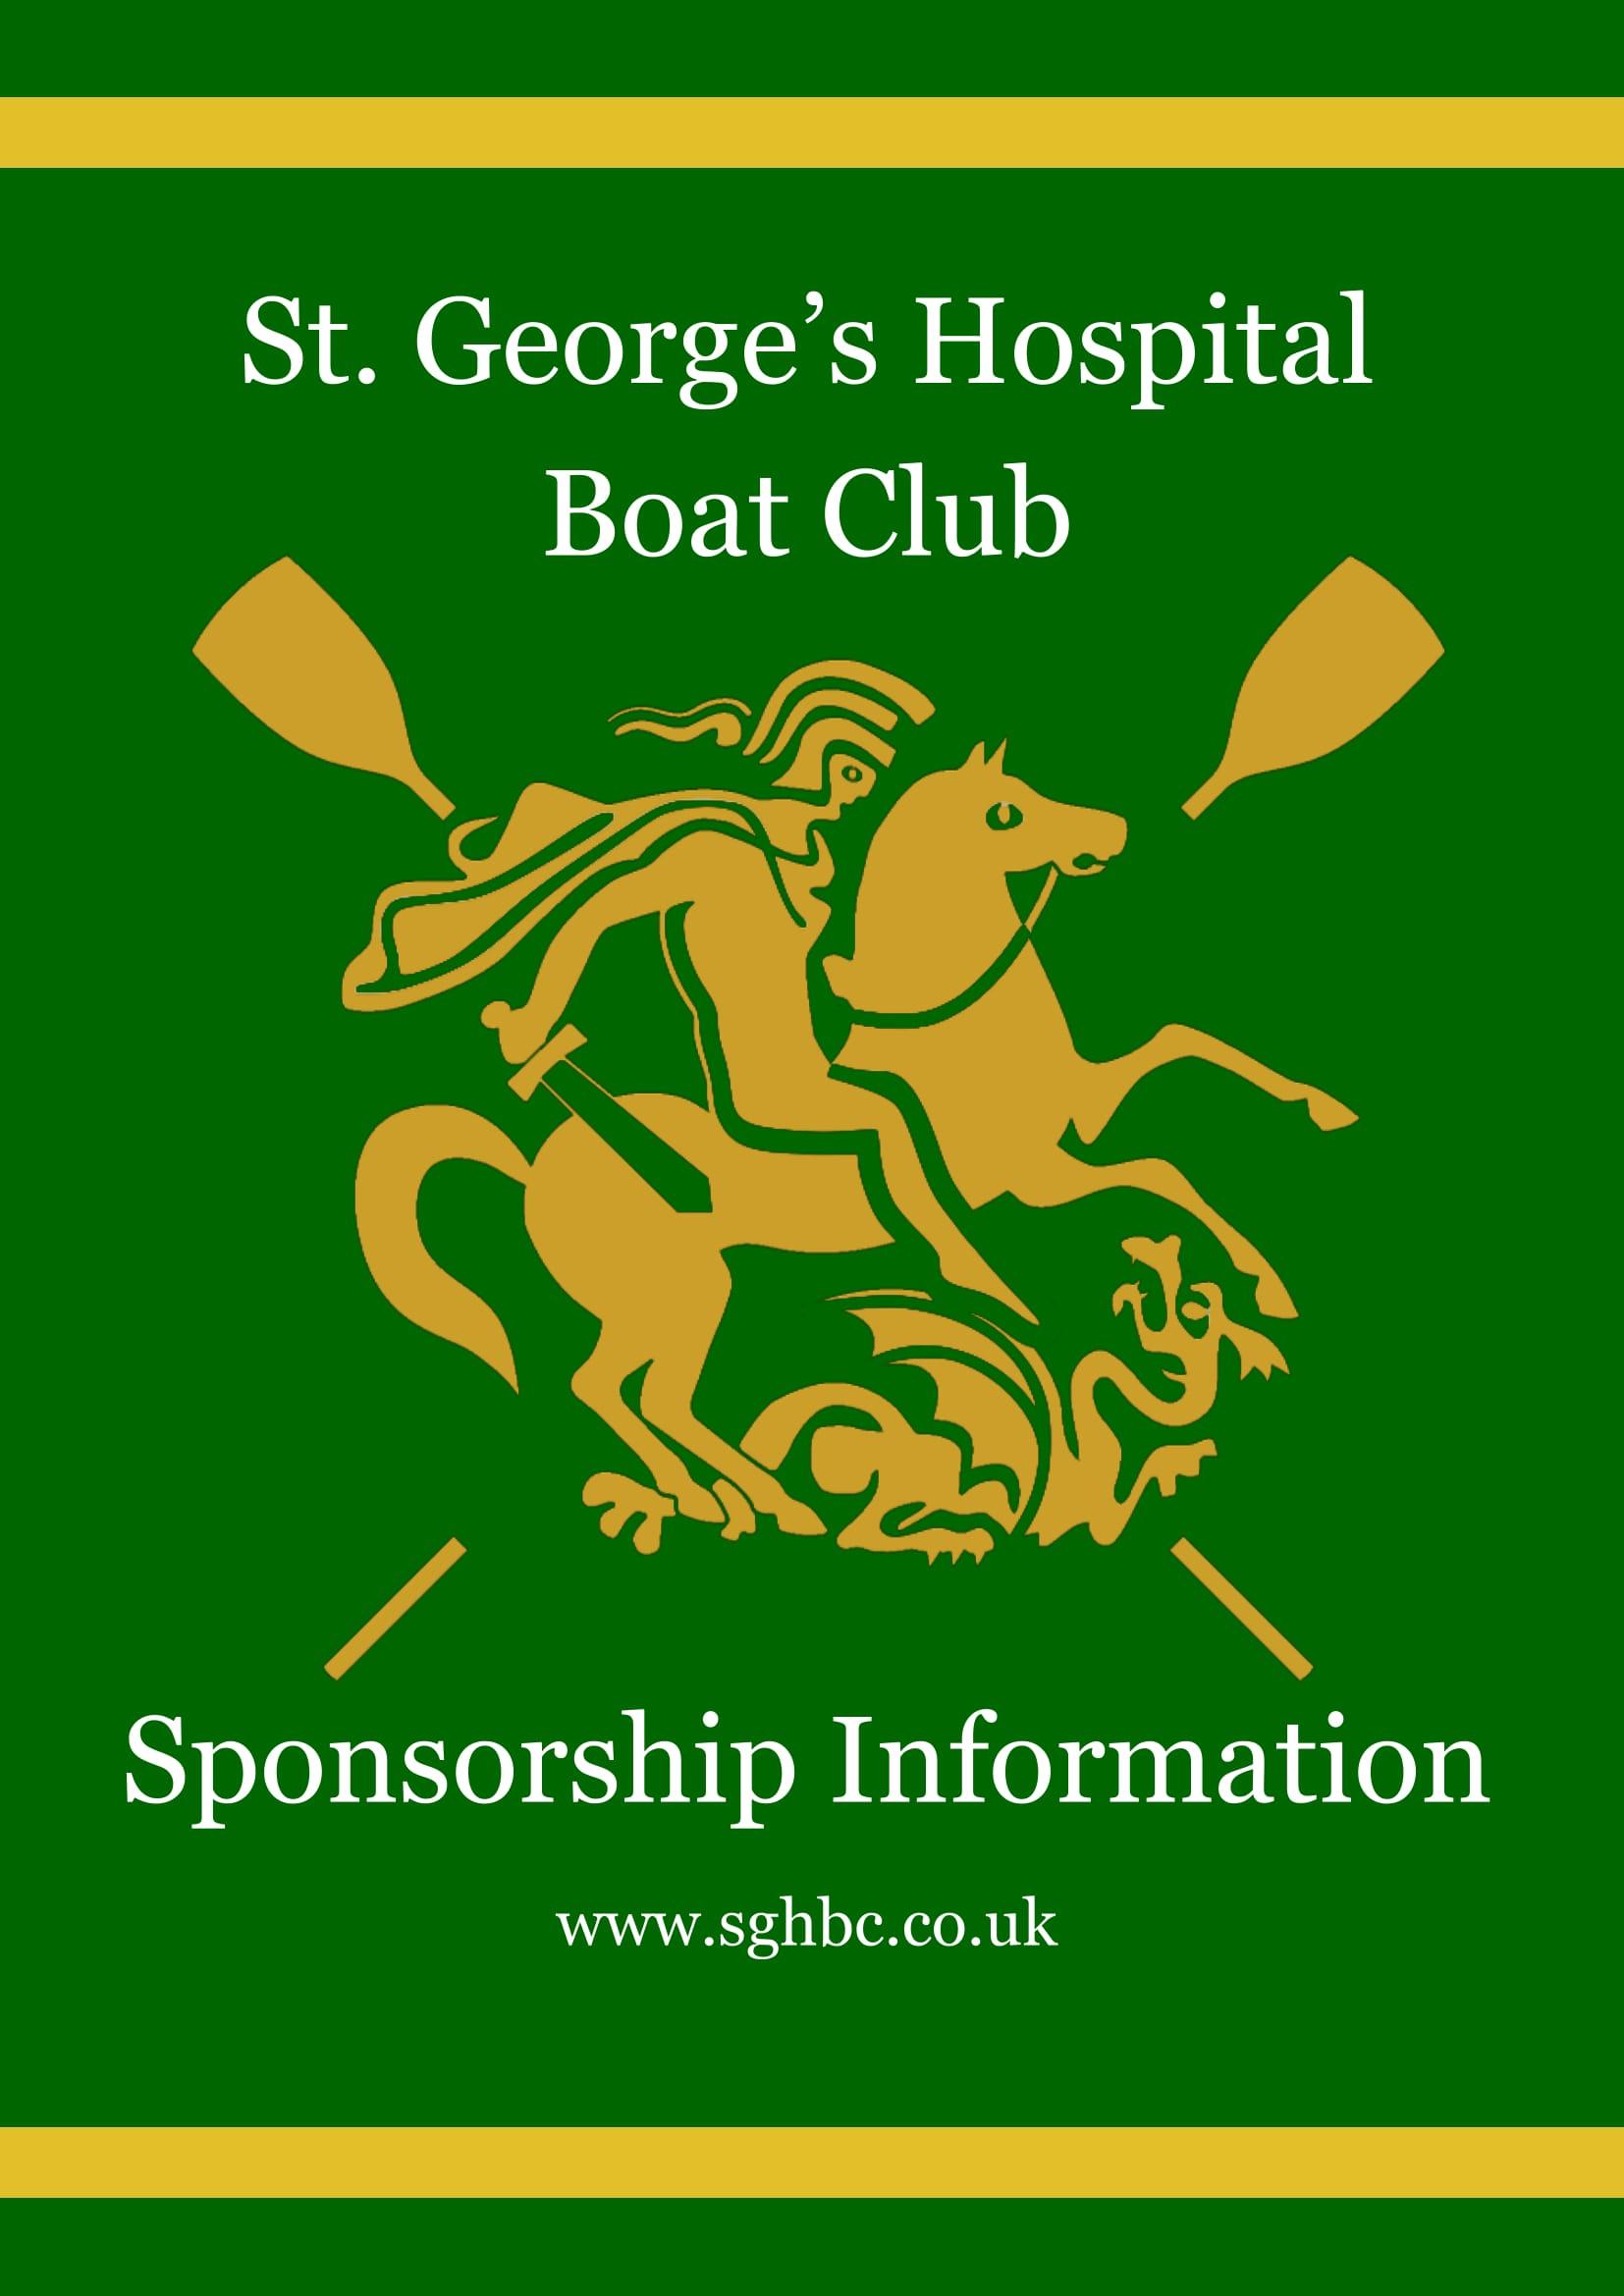 SGHBC Sponsorship Information Booklet-1.jpg